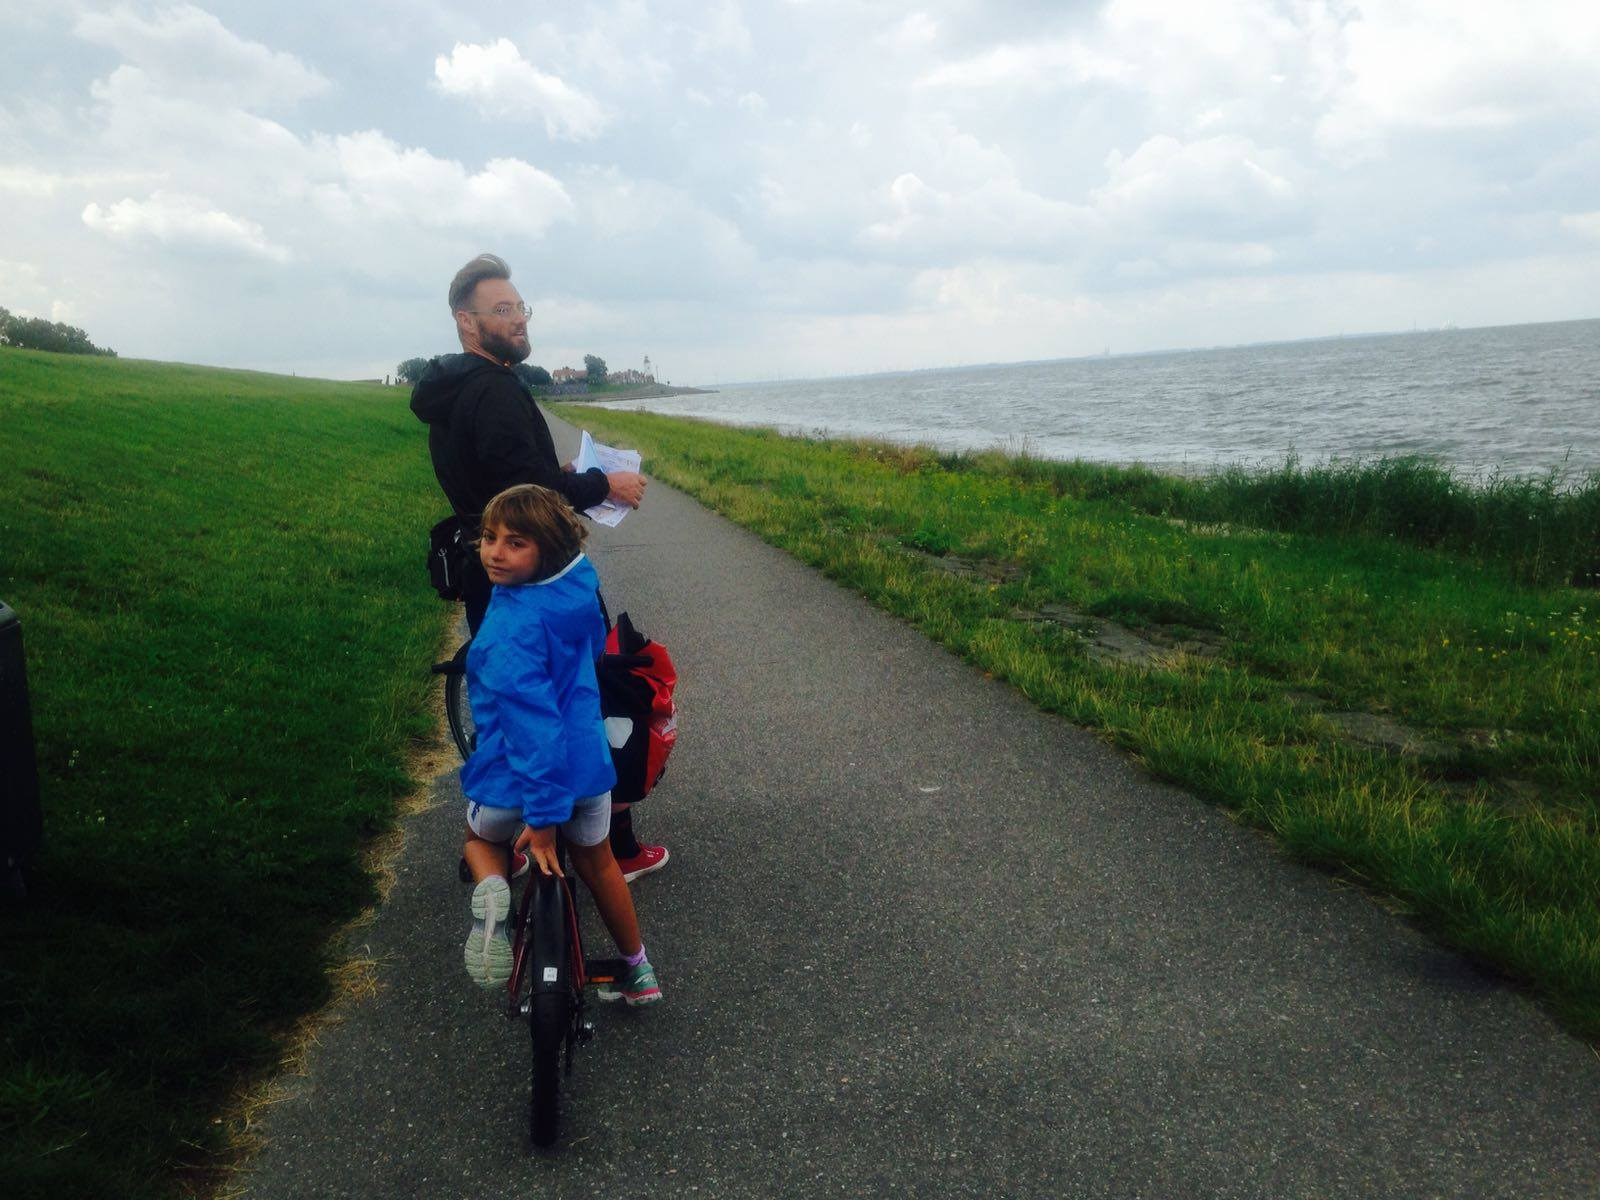 [cml_media_alt id='14637']Olanda in bicicletta coi bambini - in bici - credits Lorenzo[/cml_media_alt]